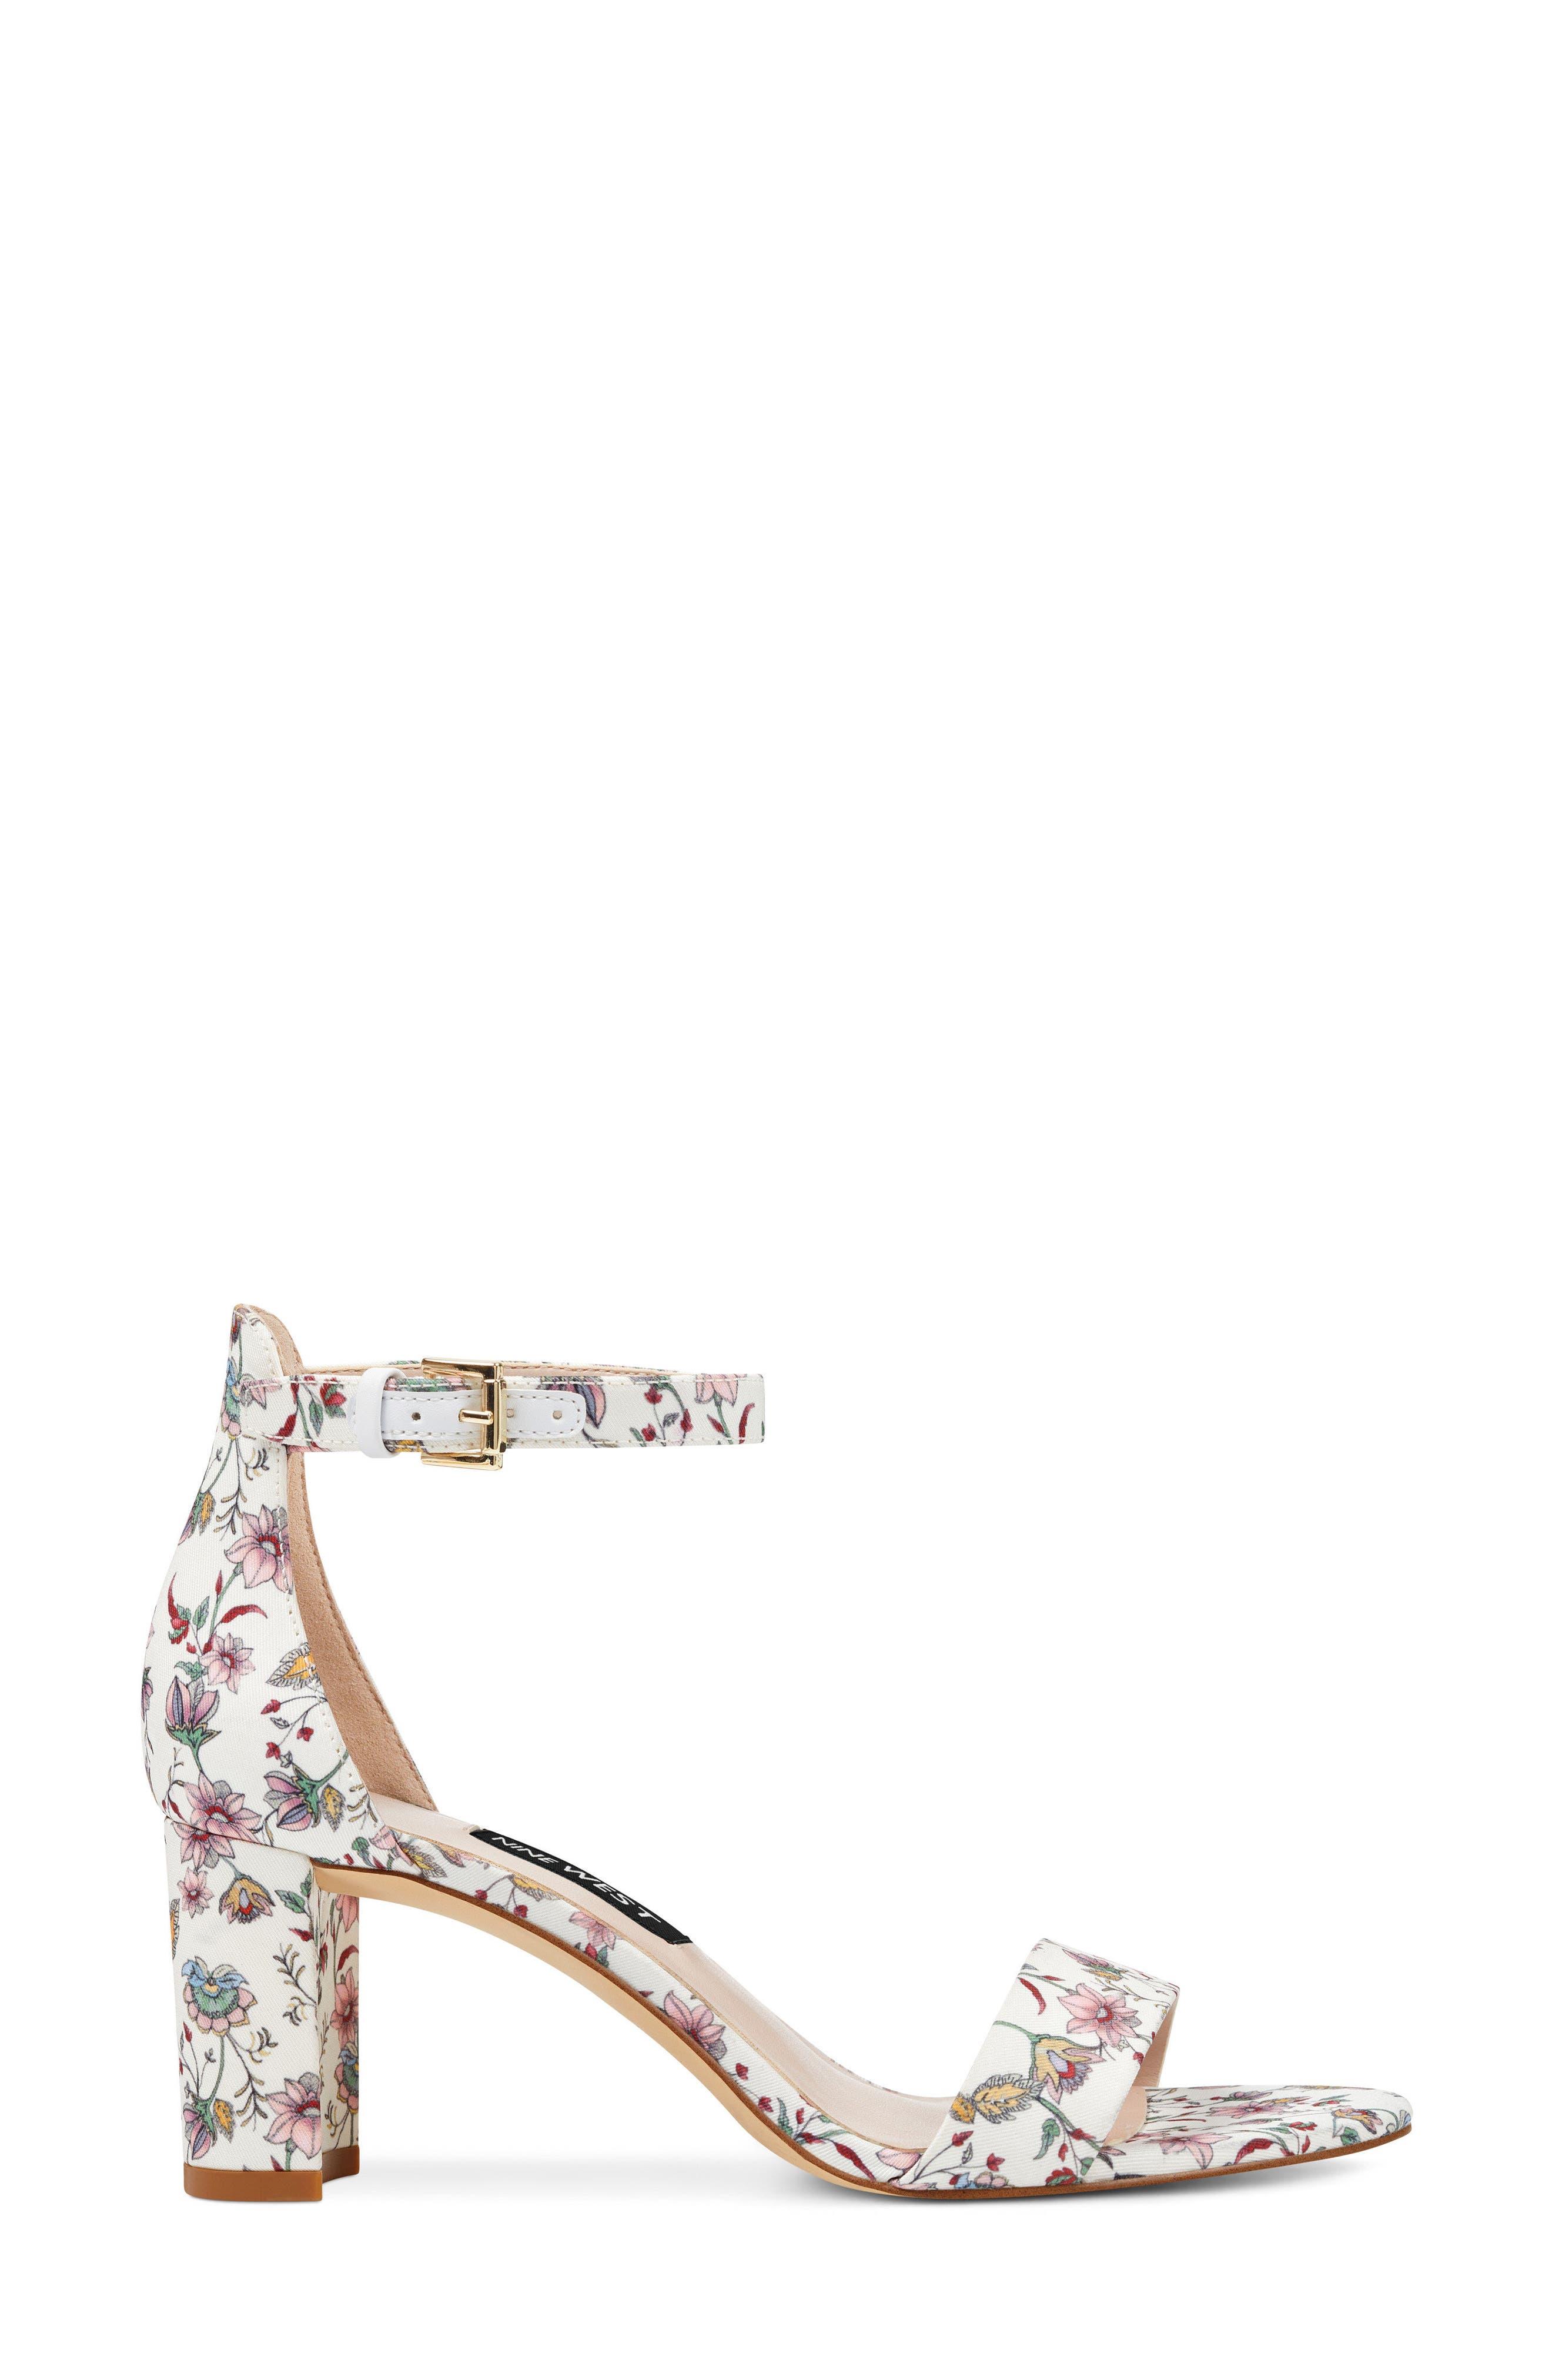 Pruce Ankle Strap Sandal,                             Alternate thumbnail 3, color,                             White Multi